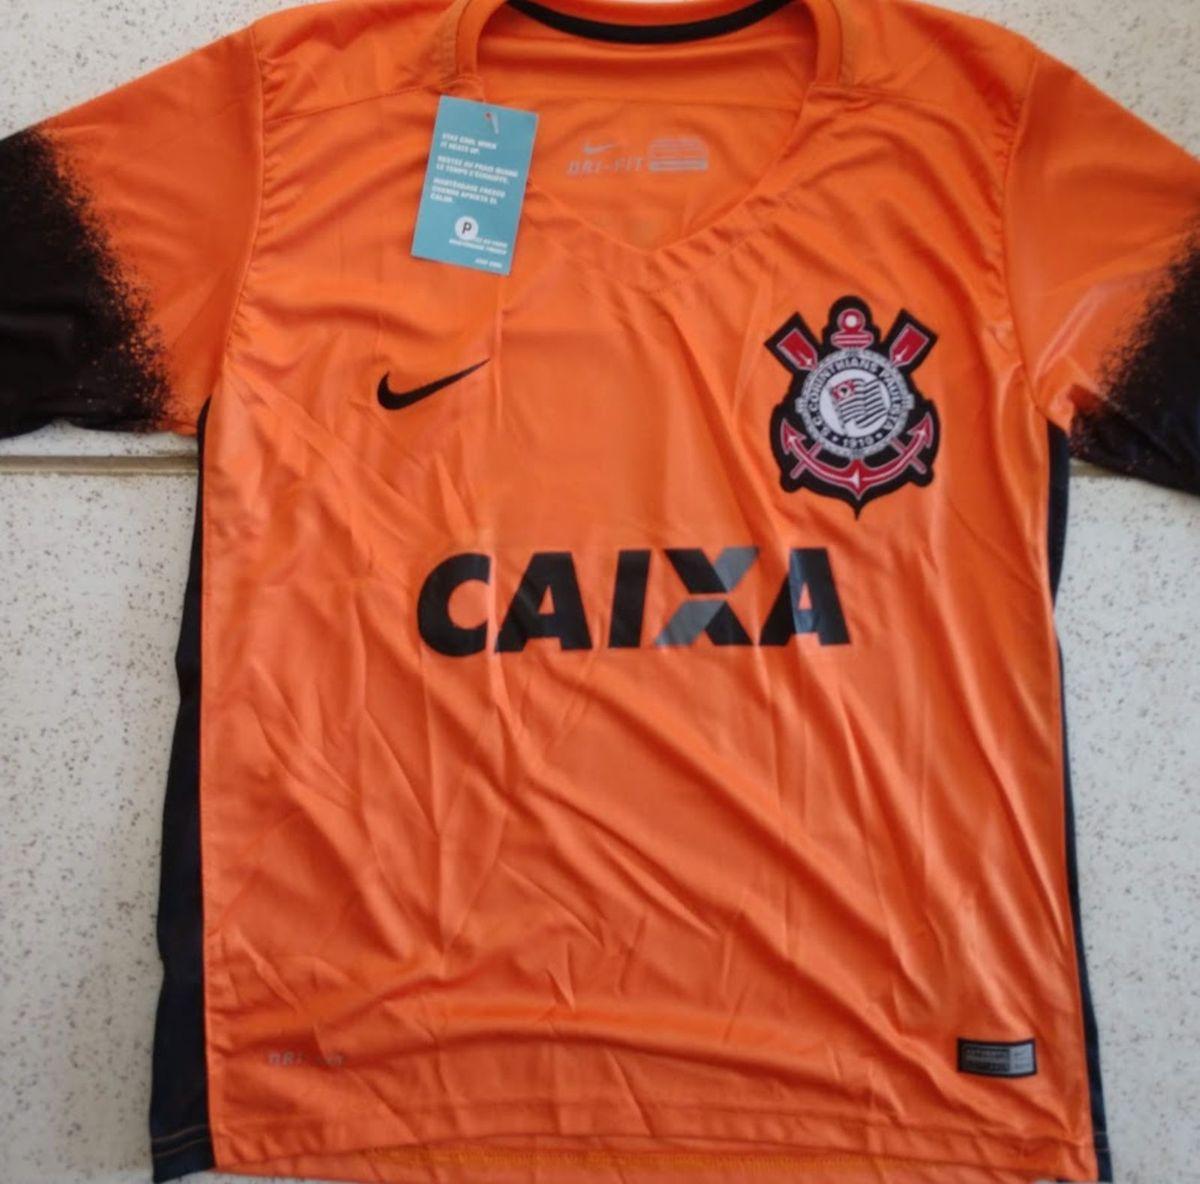 camisa corinthians laranja 2015 tamanho p - camisas nike 4eef29a8c7802